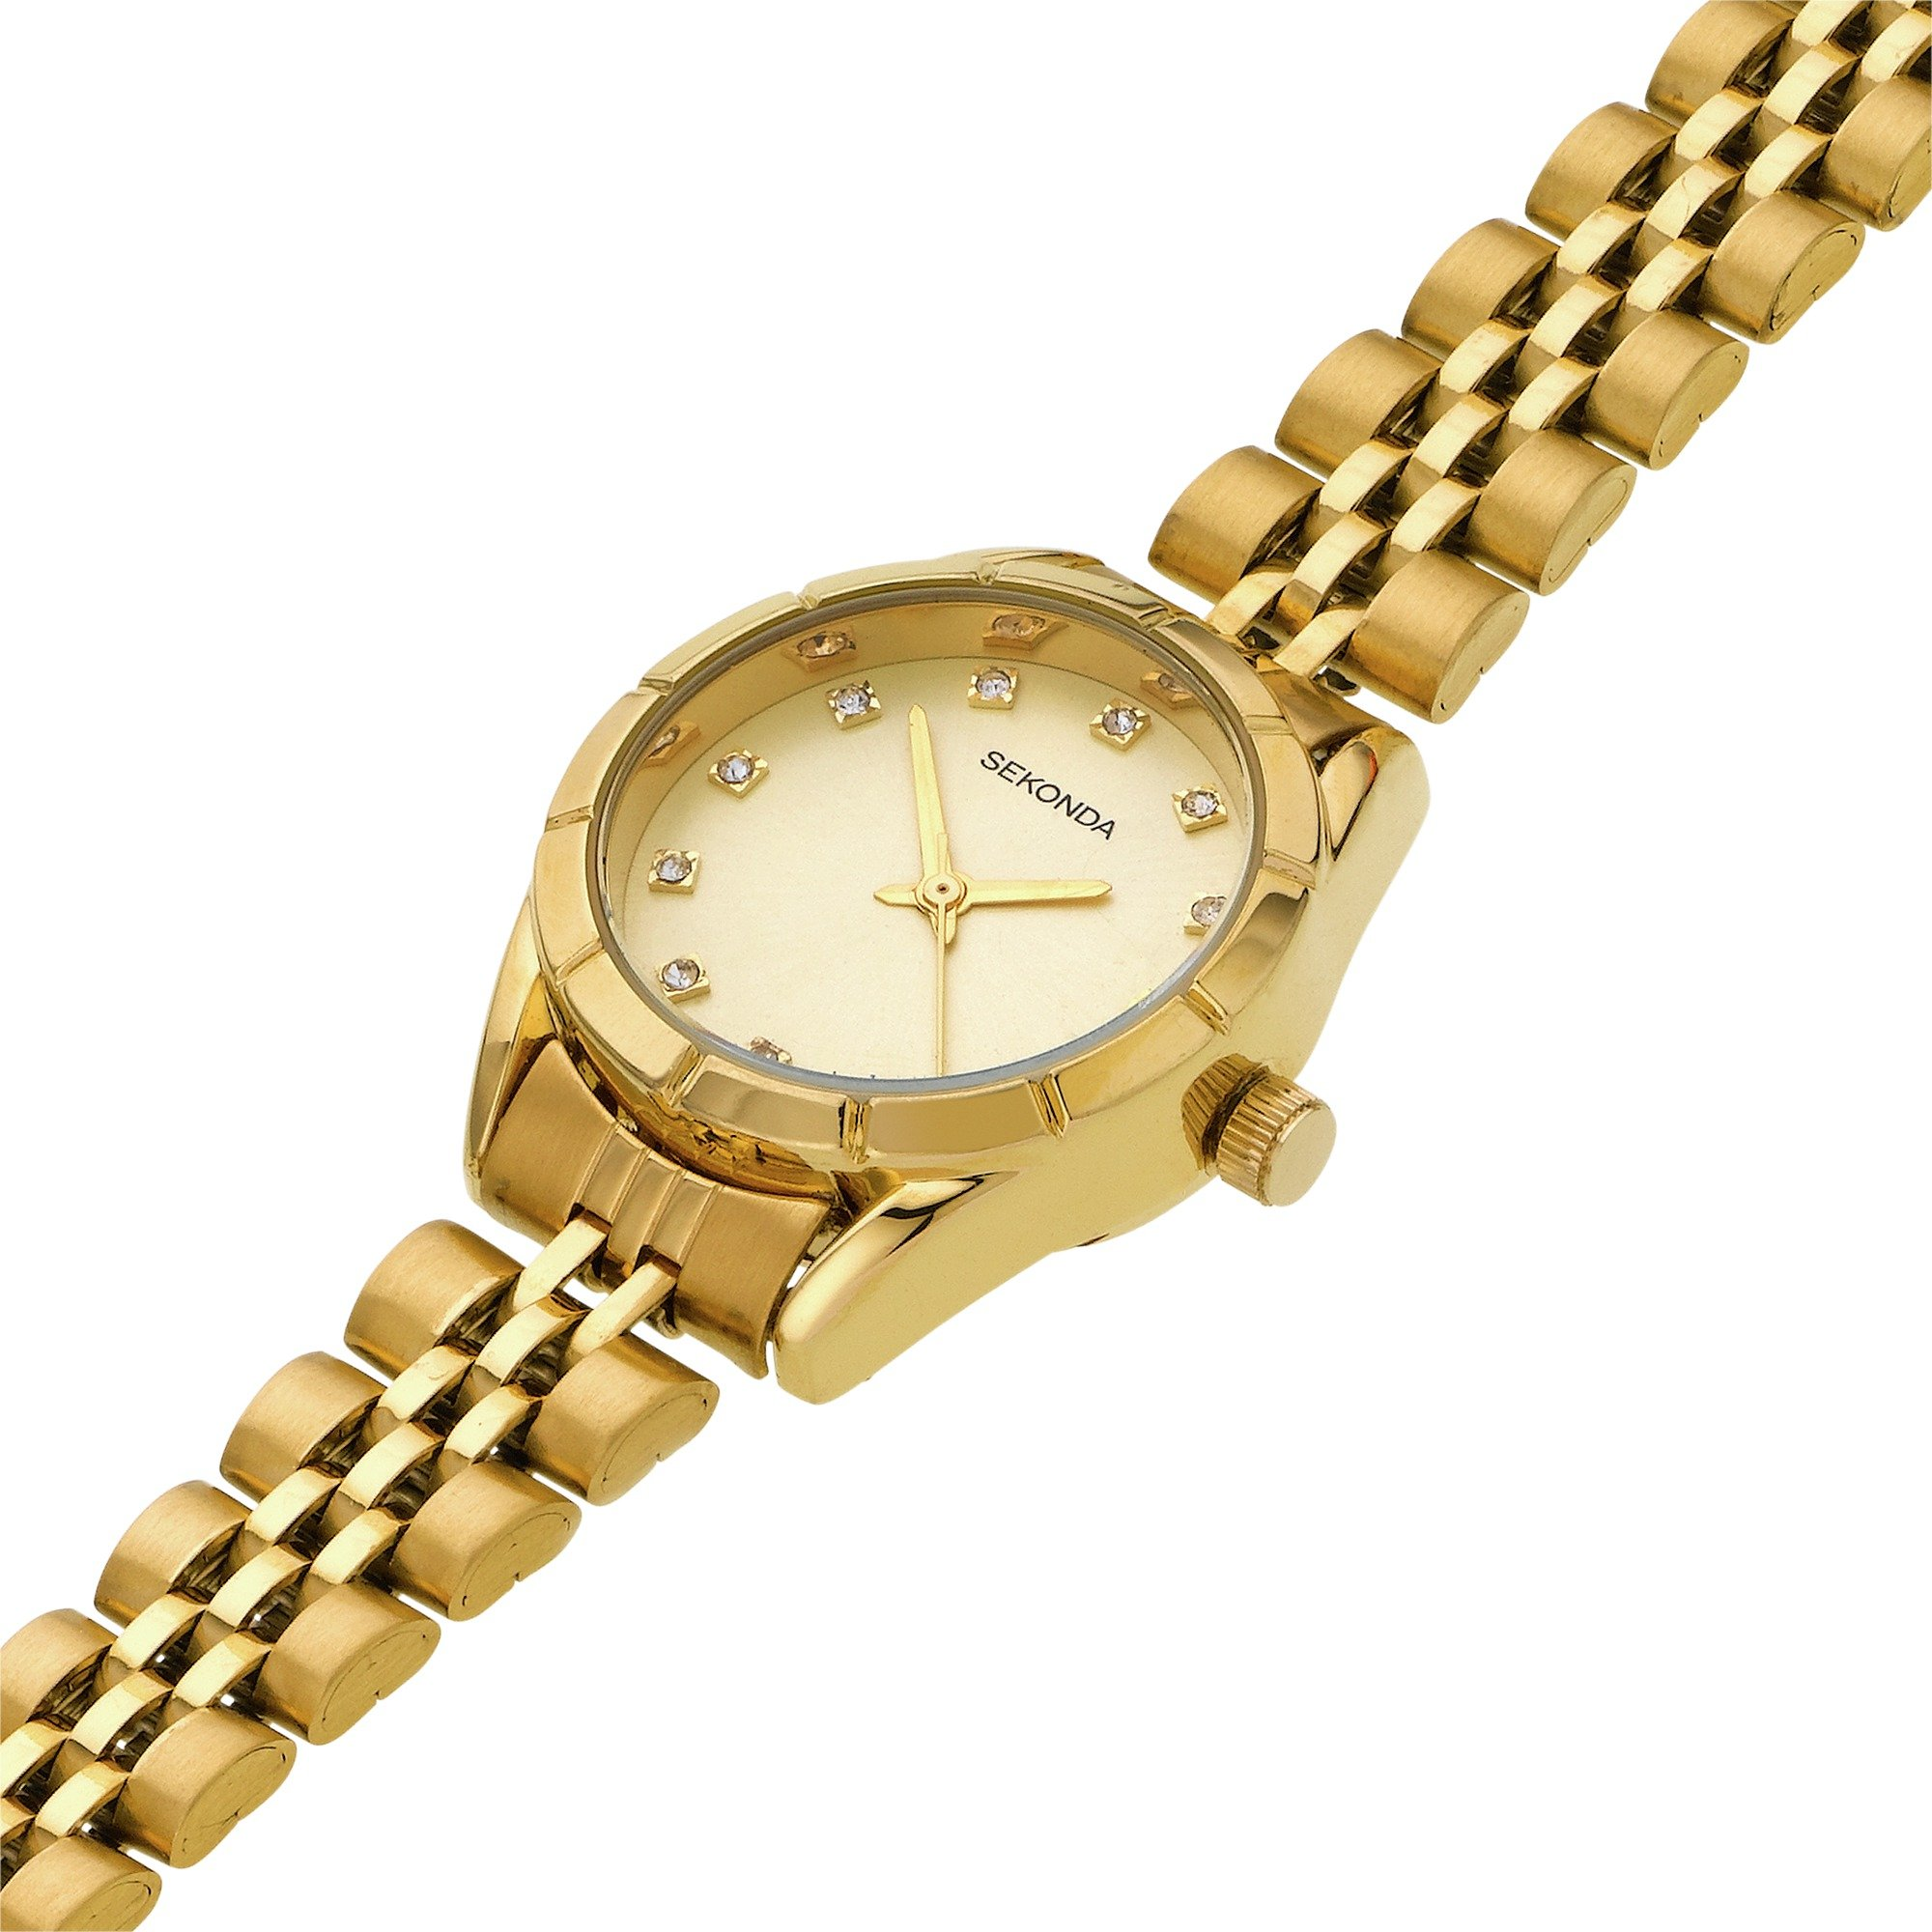 Buy Sekonda La s Gold Plated Bracelet Watch at Argos